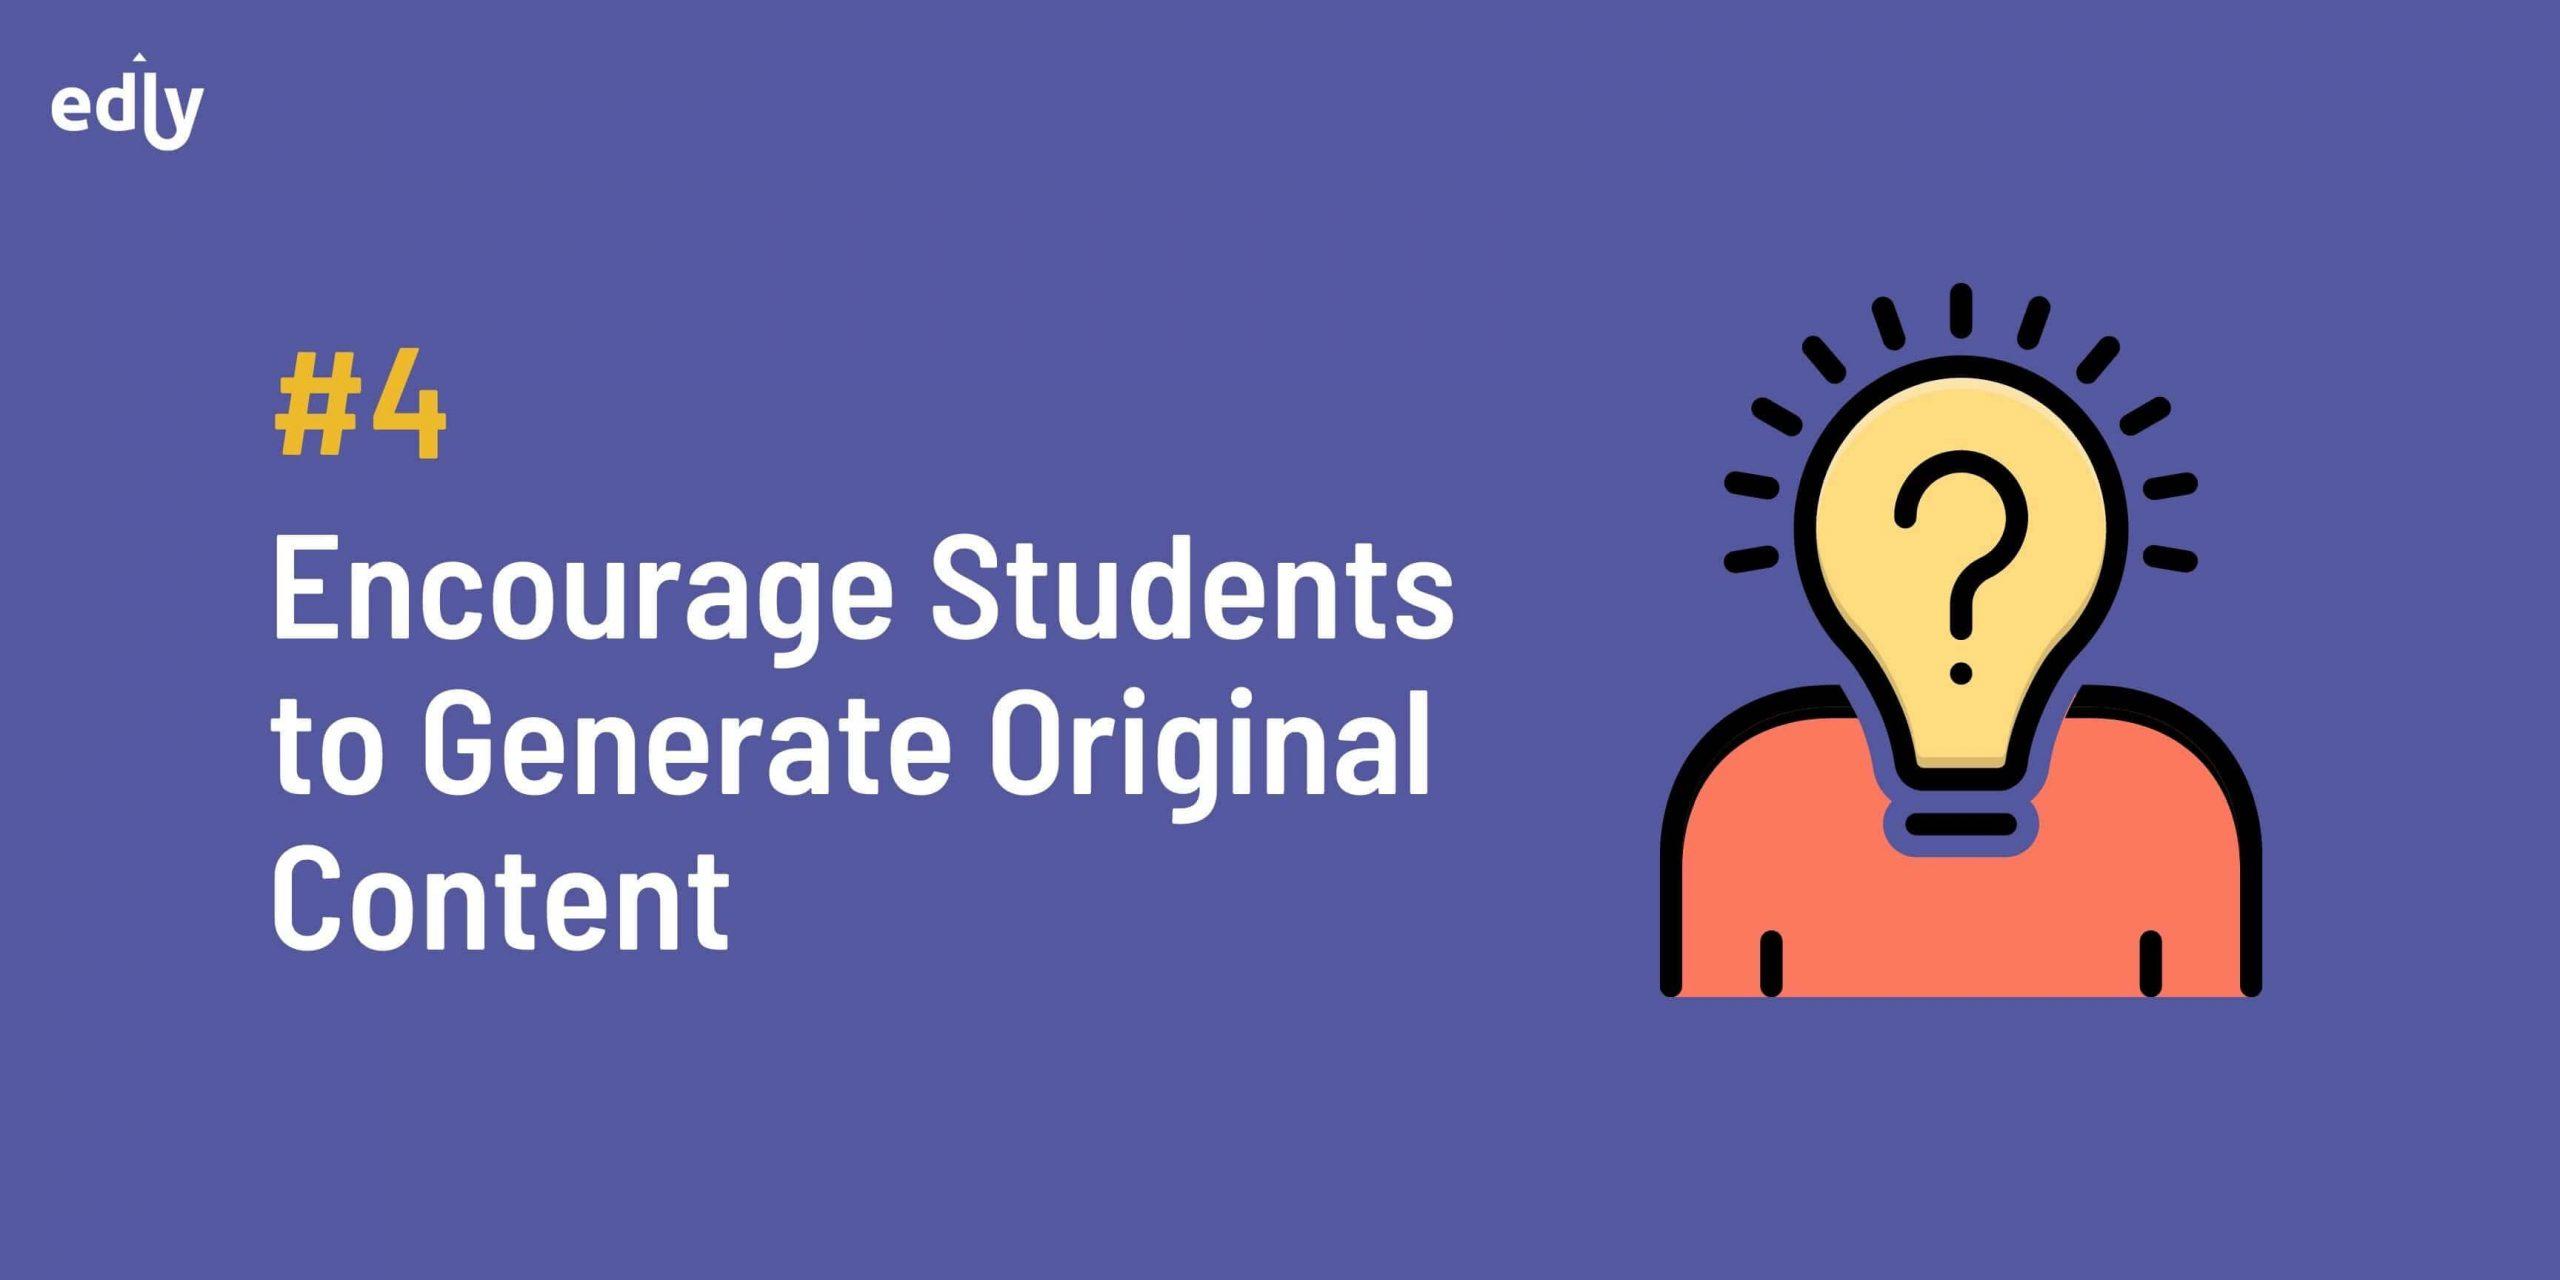 Encourage students to create original content